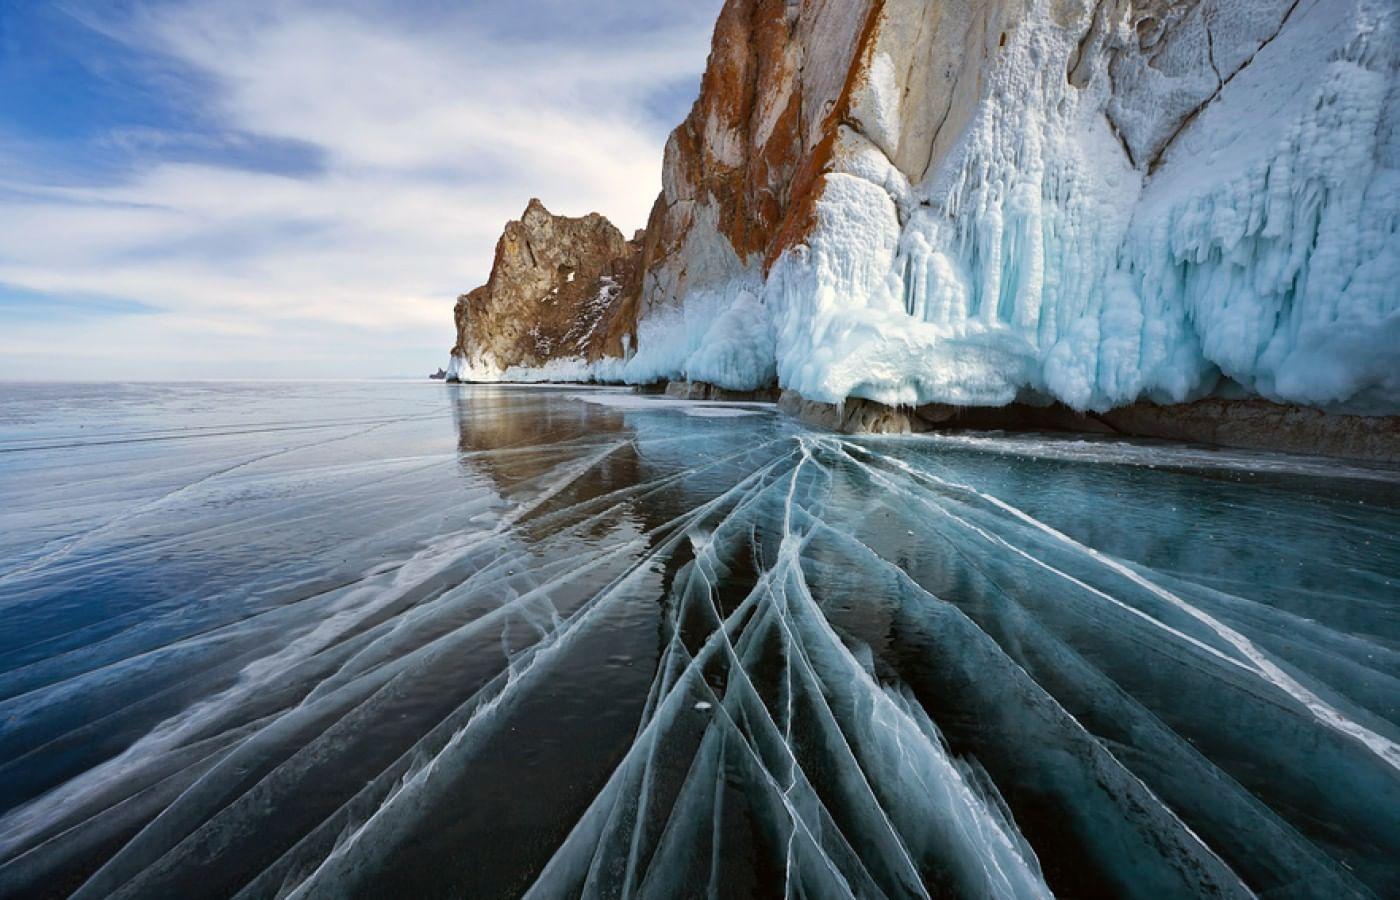 Озеро Байкал. Фотография: baikal-media.ru